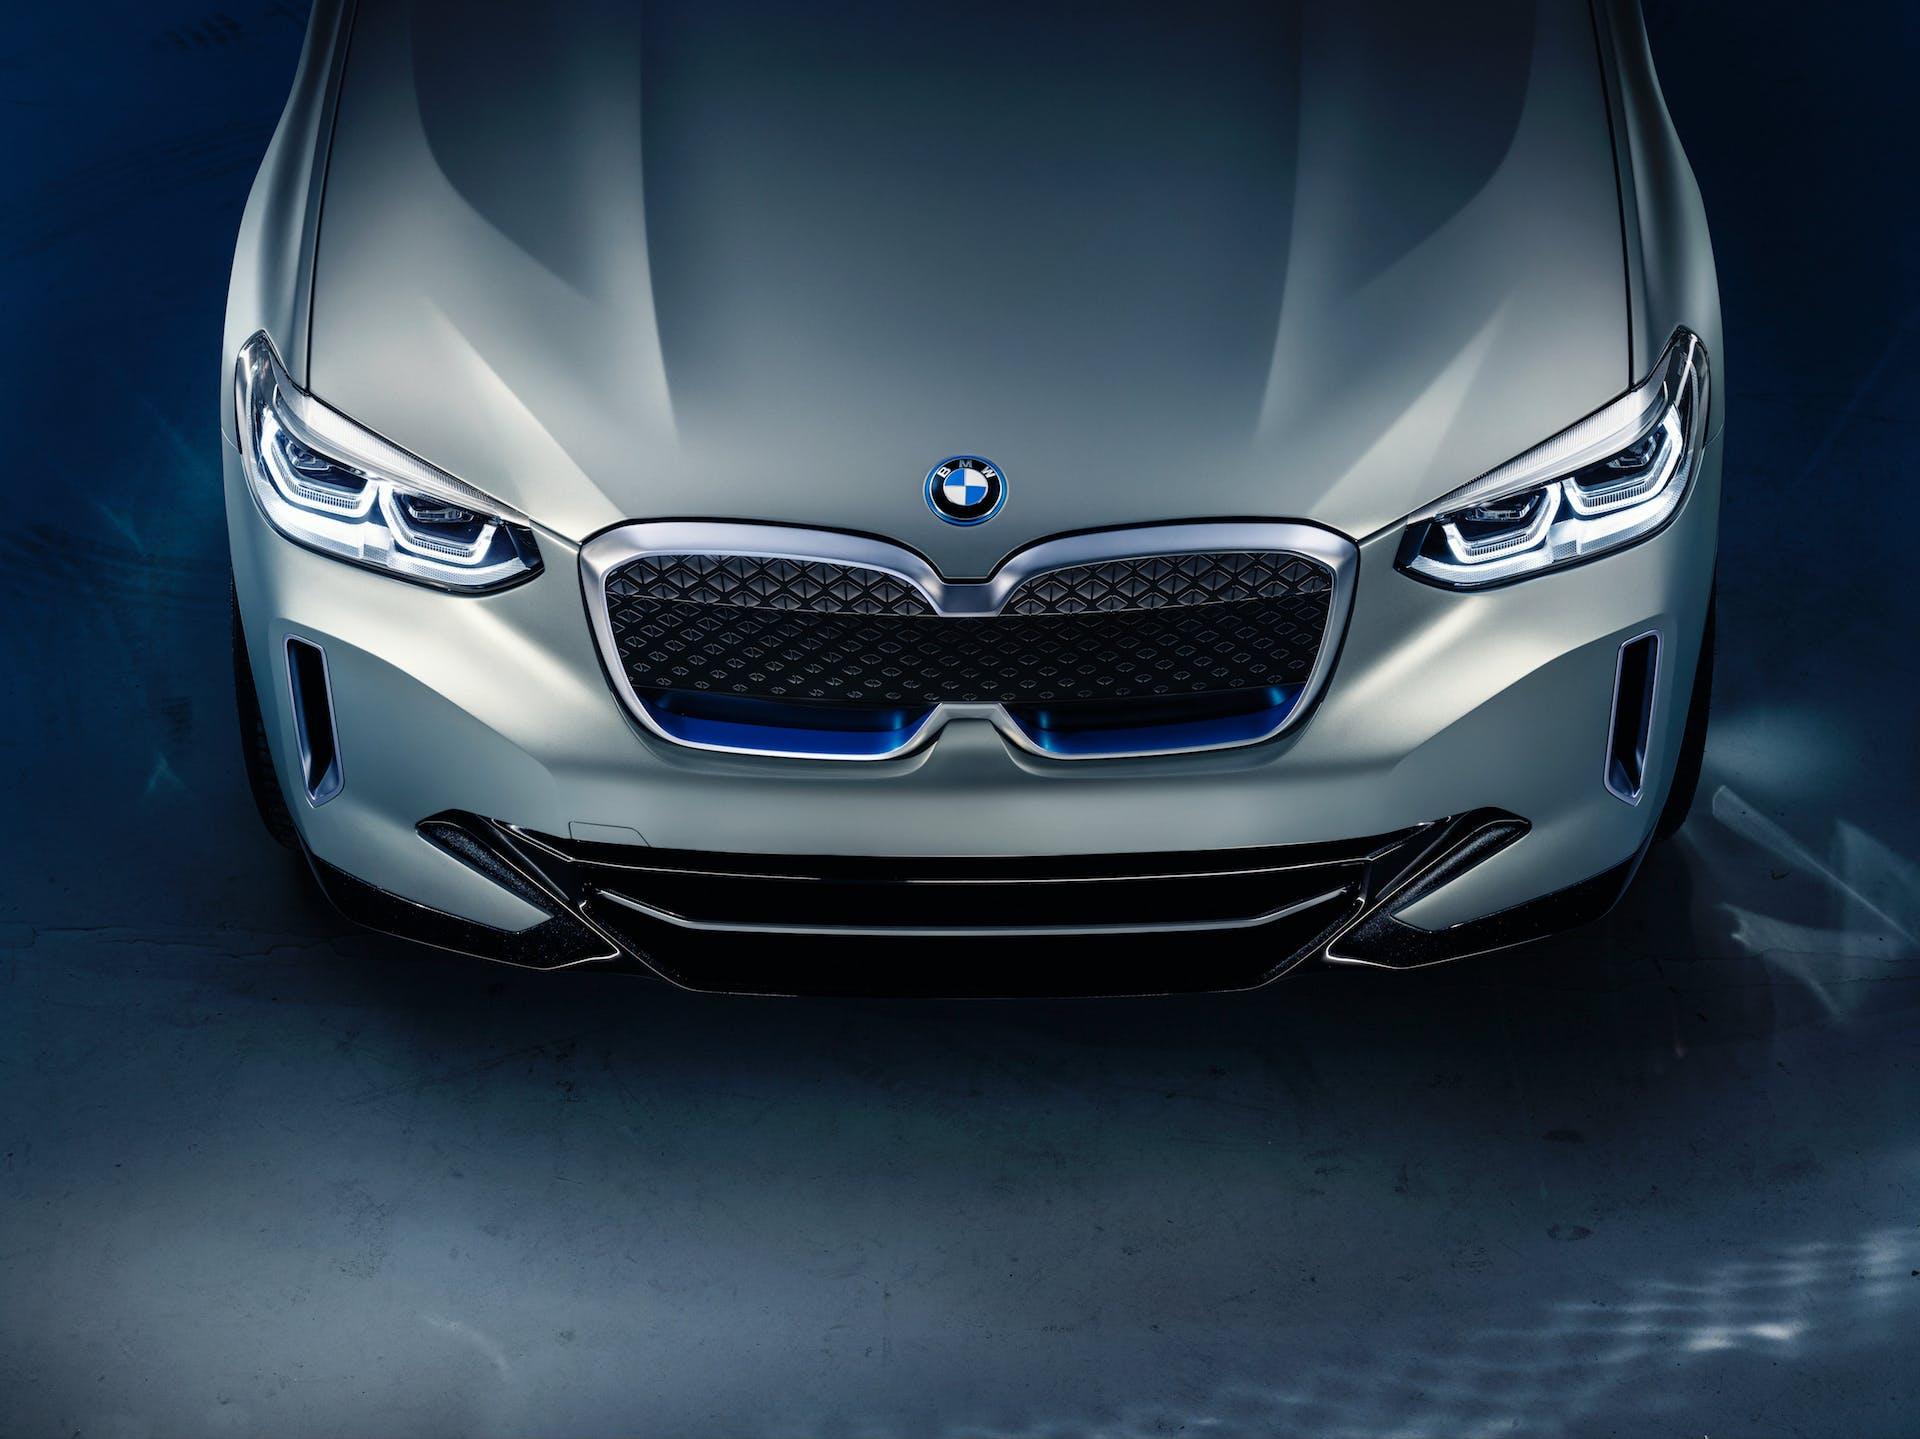 BMW Concept iX3 frontale calandra